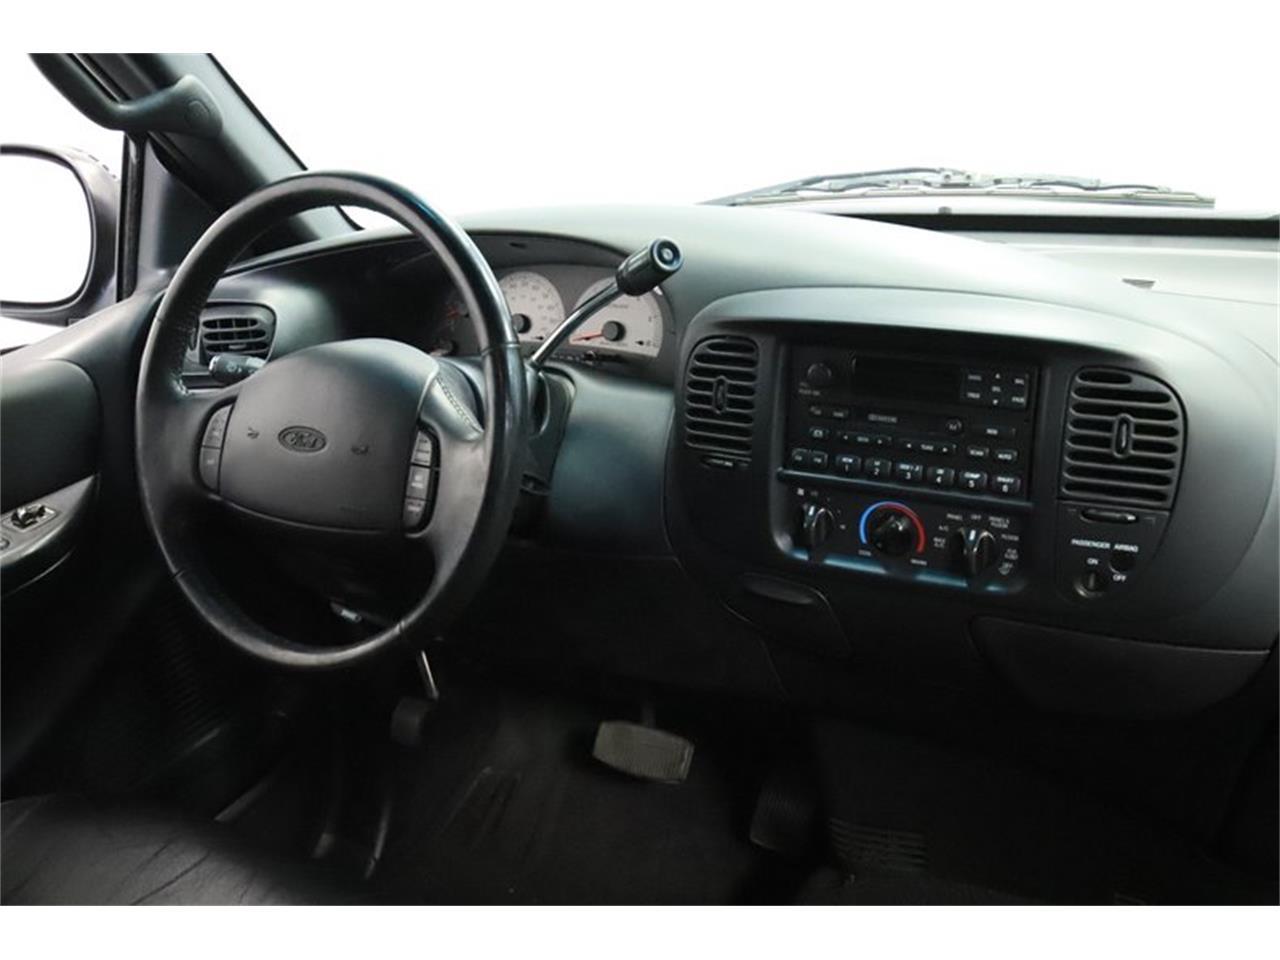 2000 Ford F150 (CC-1207272) for sale in Mesa, Arizona